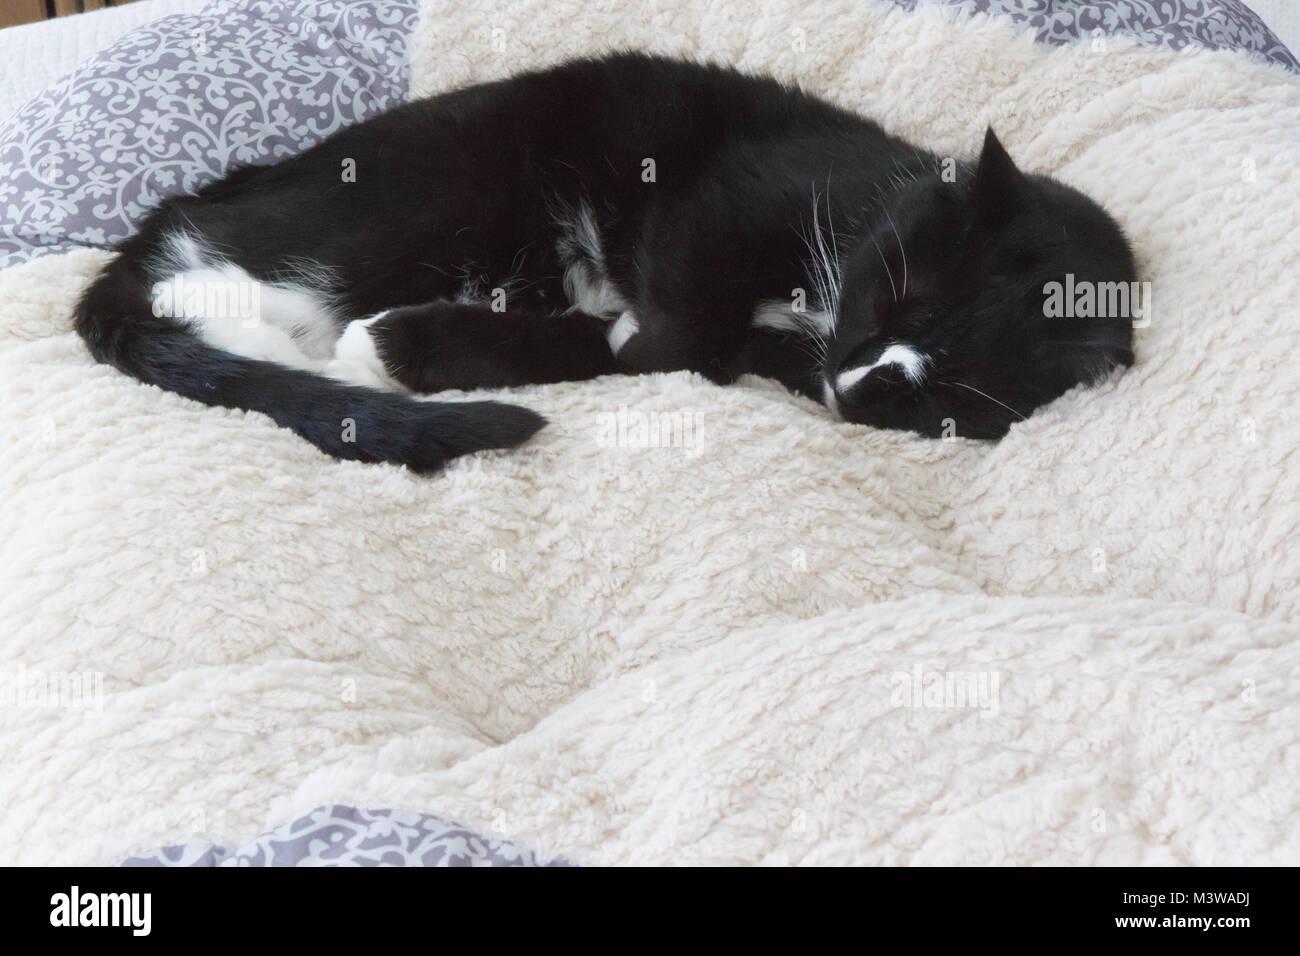 Black and White Tuxedo cat asleep on top of fluffy white blanket. Cat in fetal position. Room for copy on blanket - Stock Image